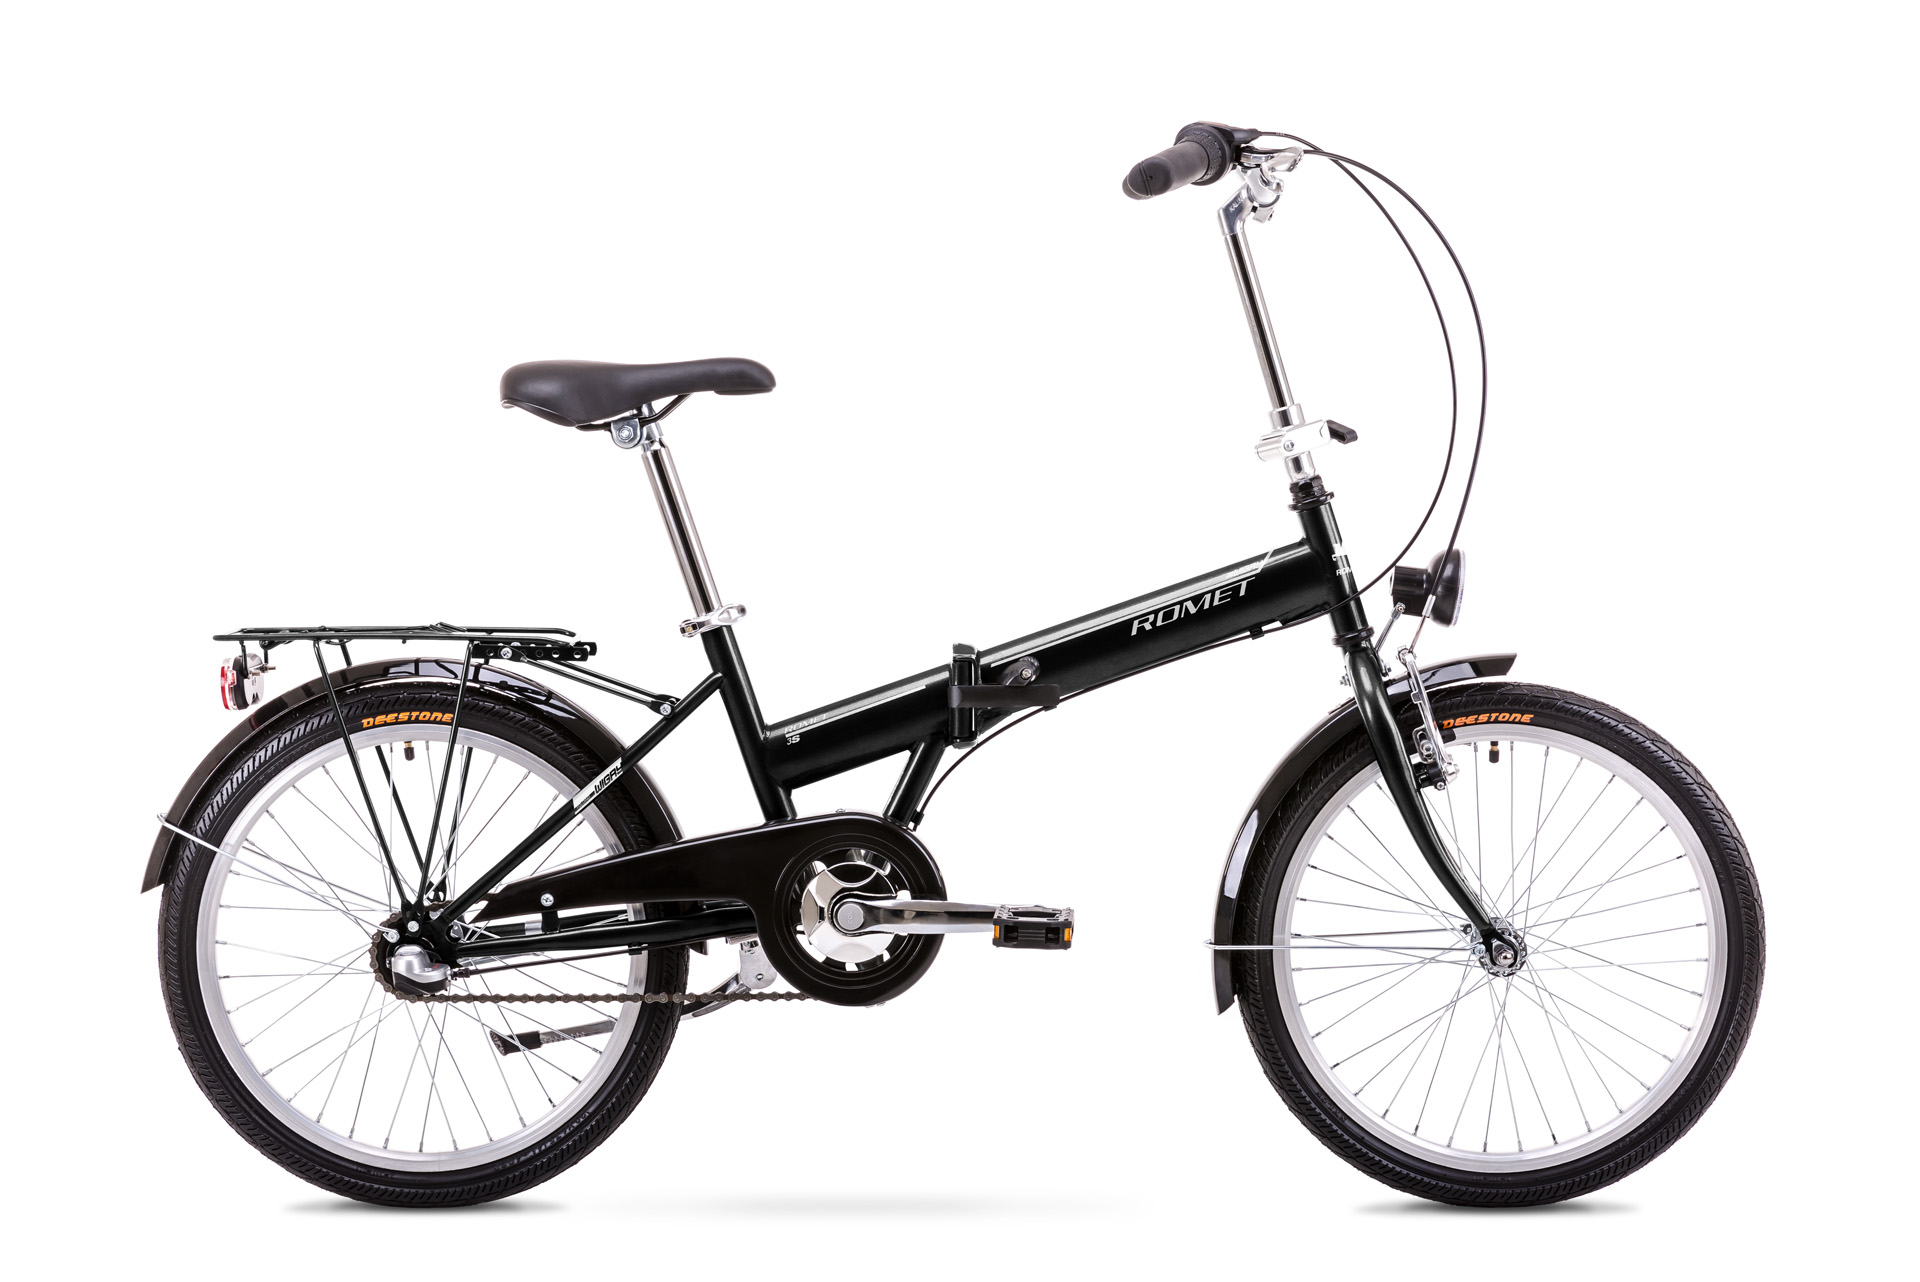 Bicicleta pliabila Unisex Romet Wigry 2 Negru/Alb 2019 imagine